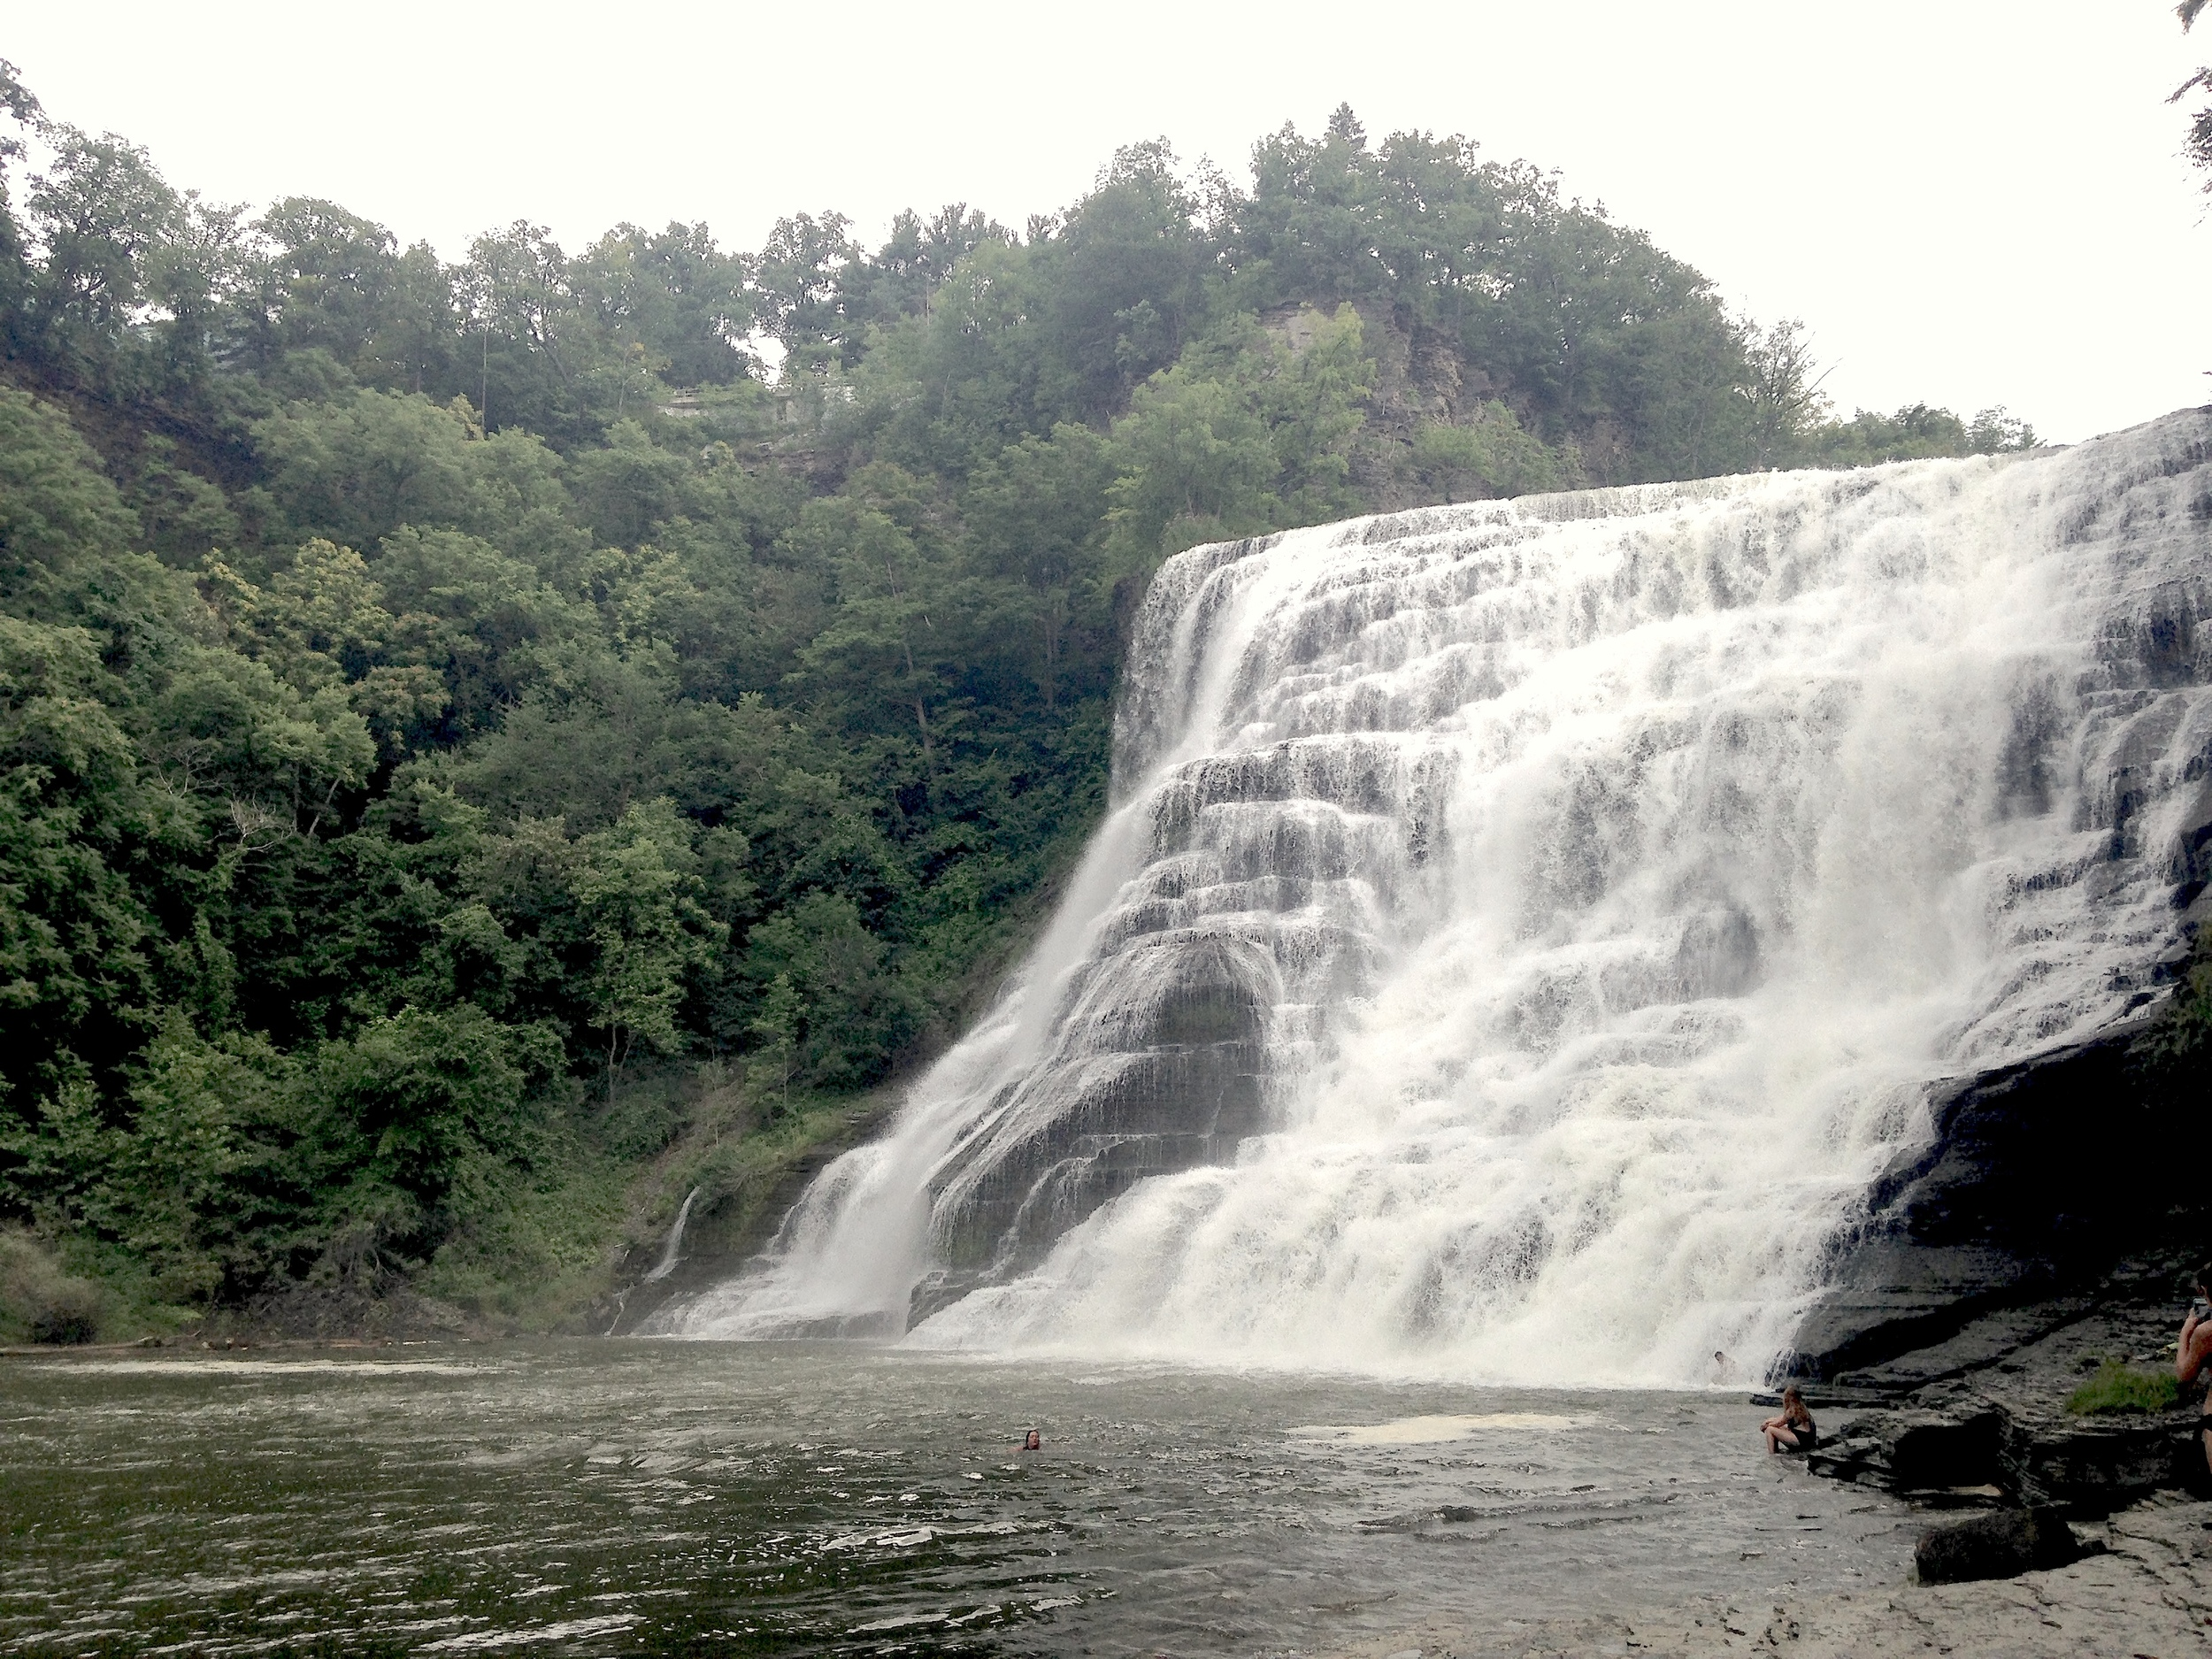 Ithaca Falls - Ithaca, New York